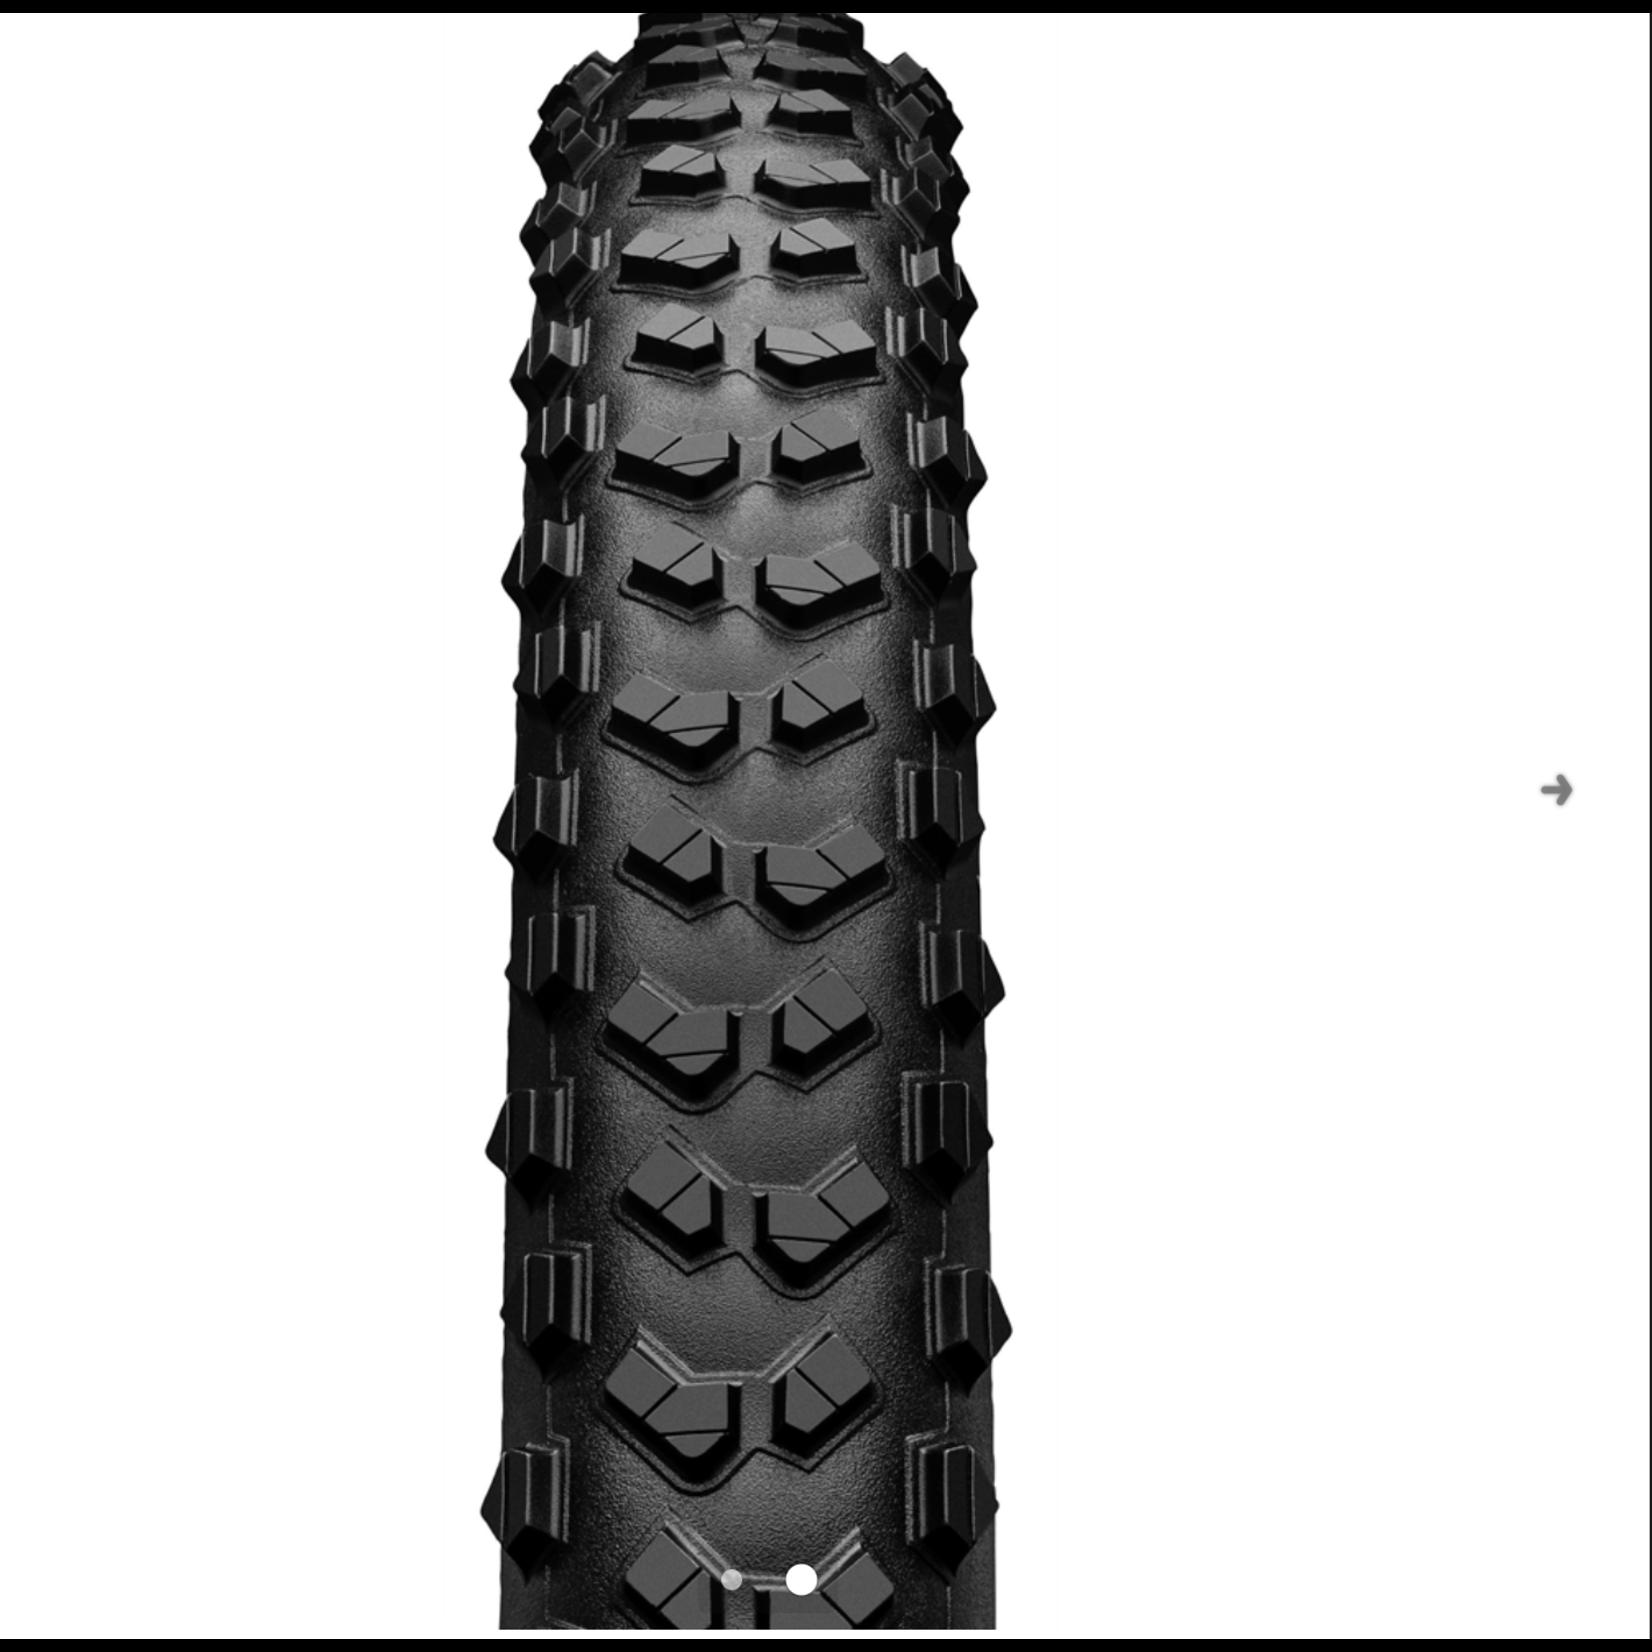 CONTINENTAL TIRES Continental XC/Enduro Tires Mountain King 27.5 x 2.6 Folding ProTection + Black Chili